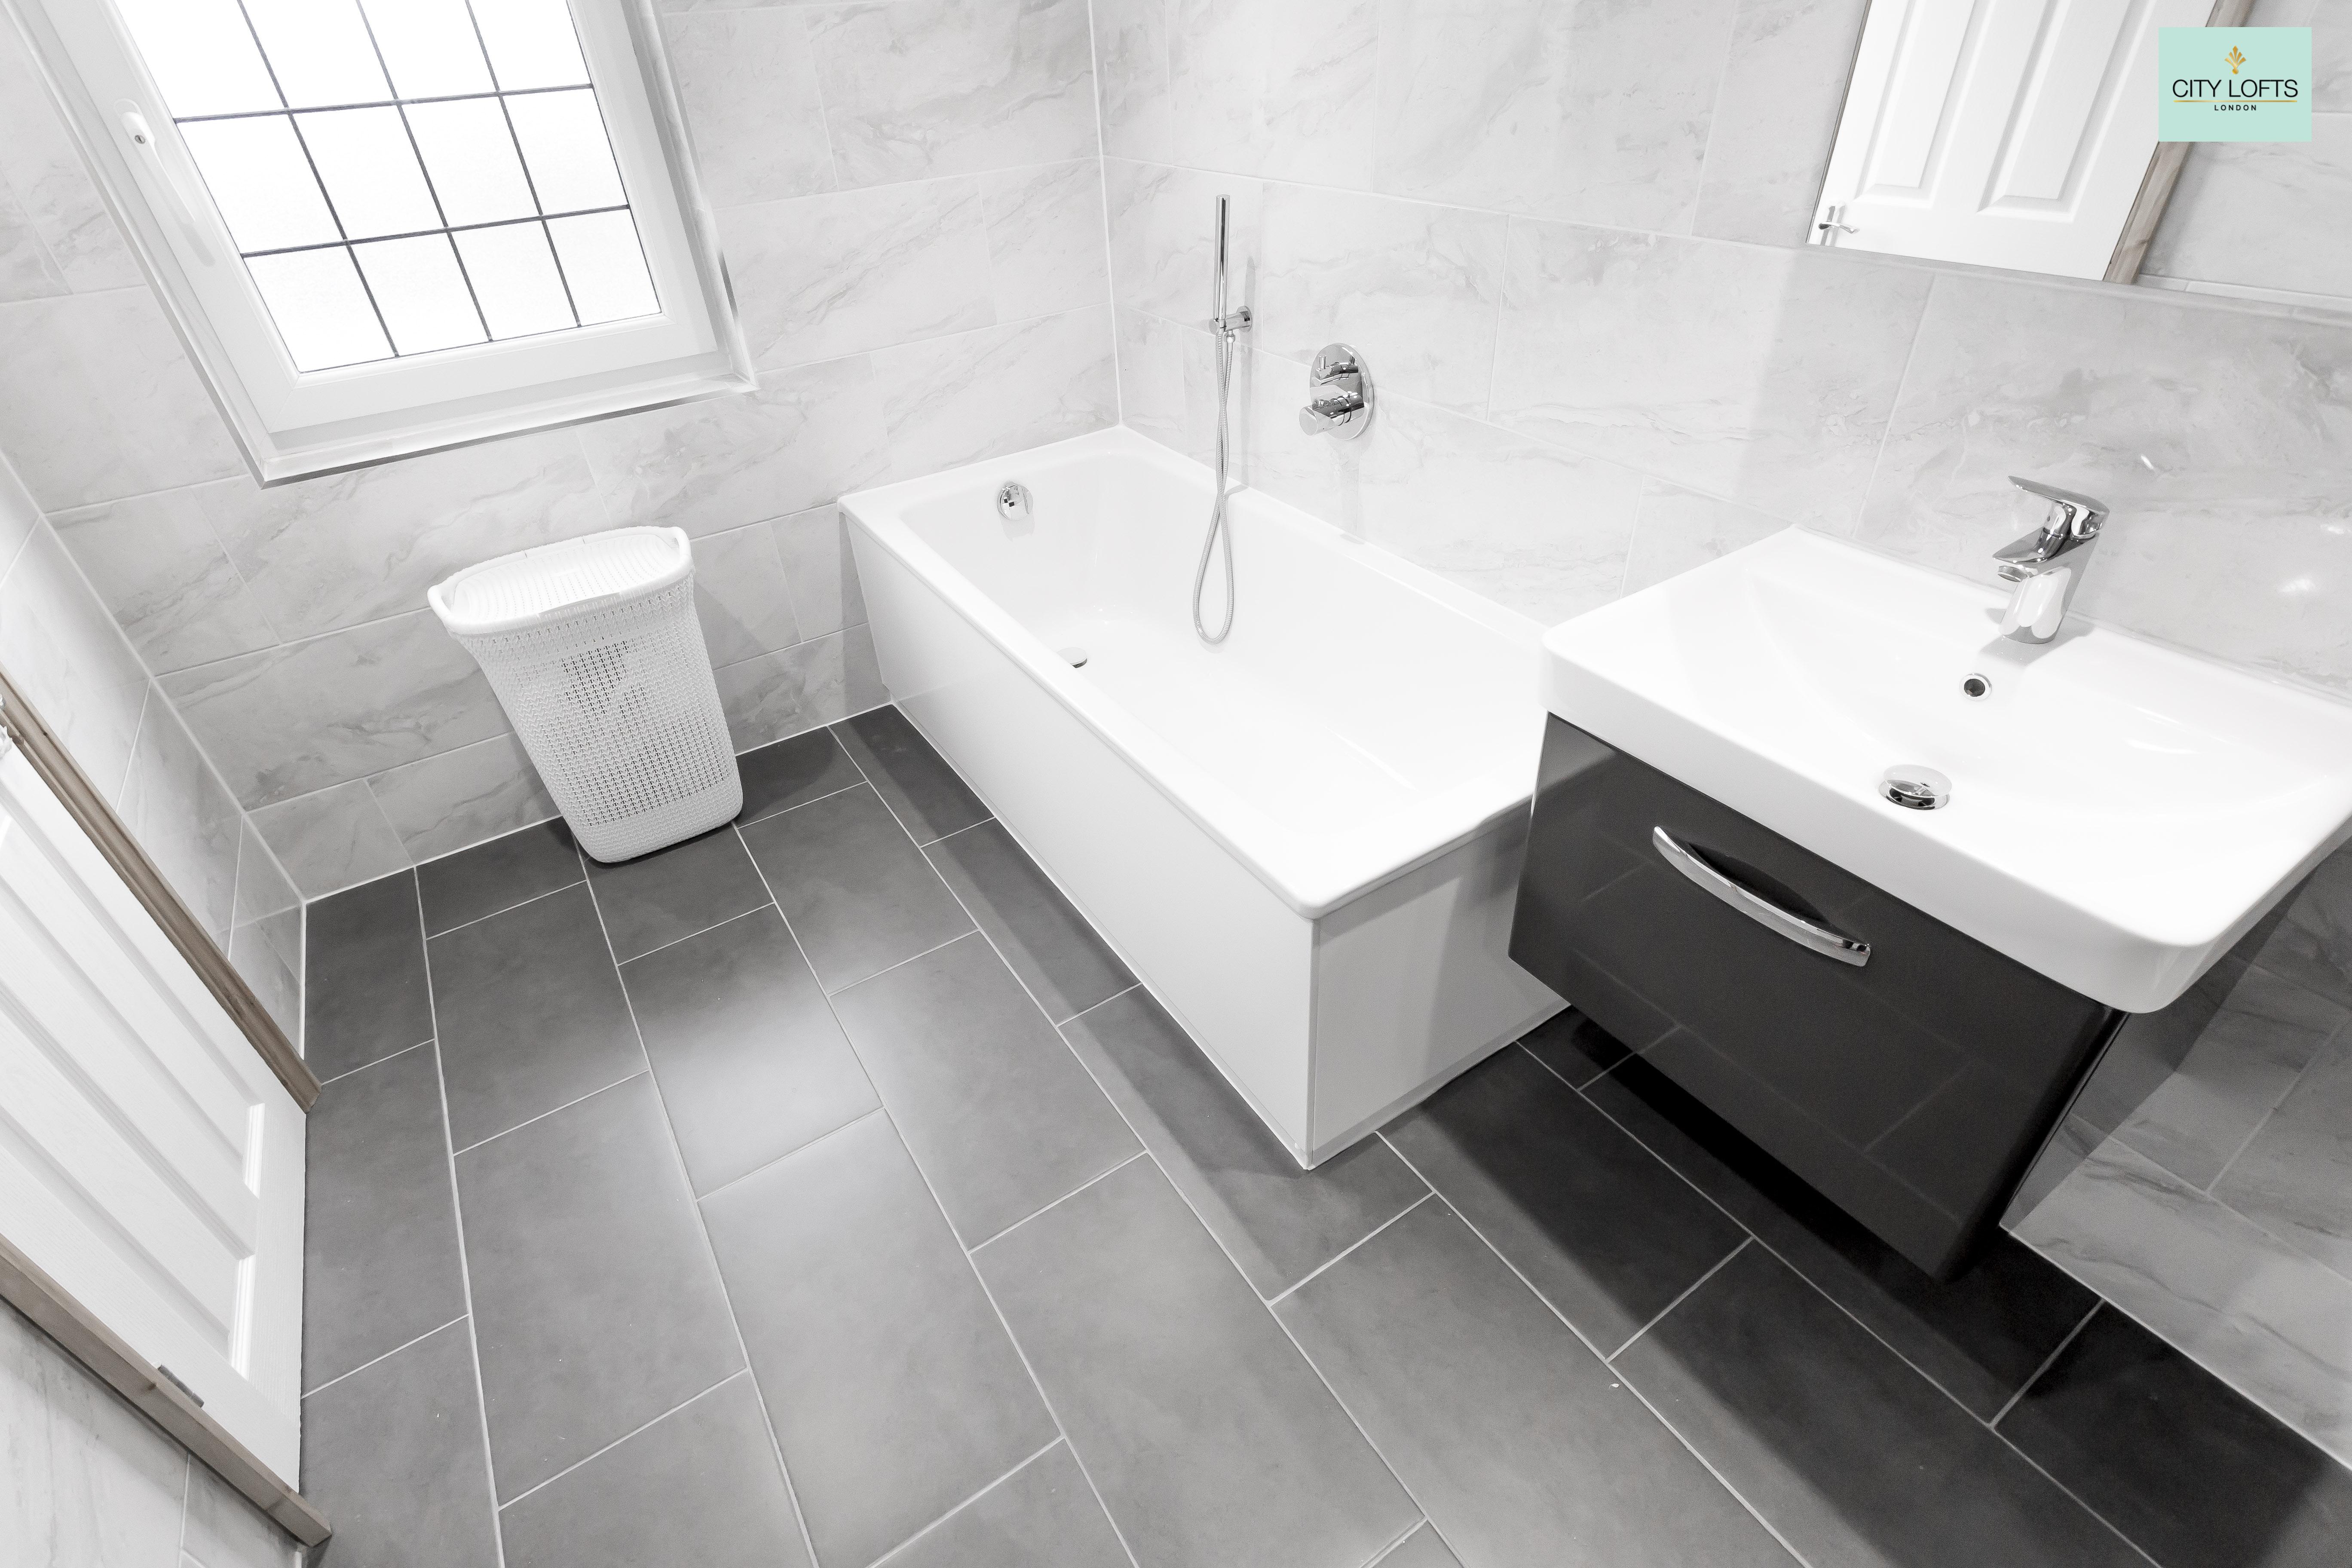 Totteridge loft conversion bathroom with bath